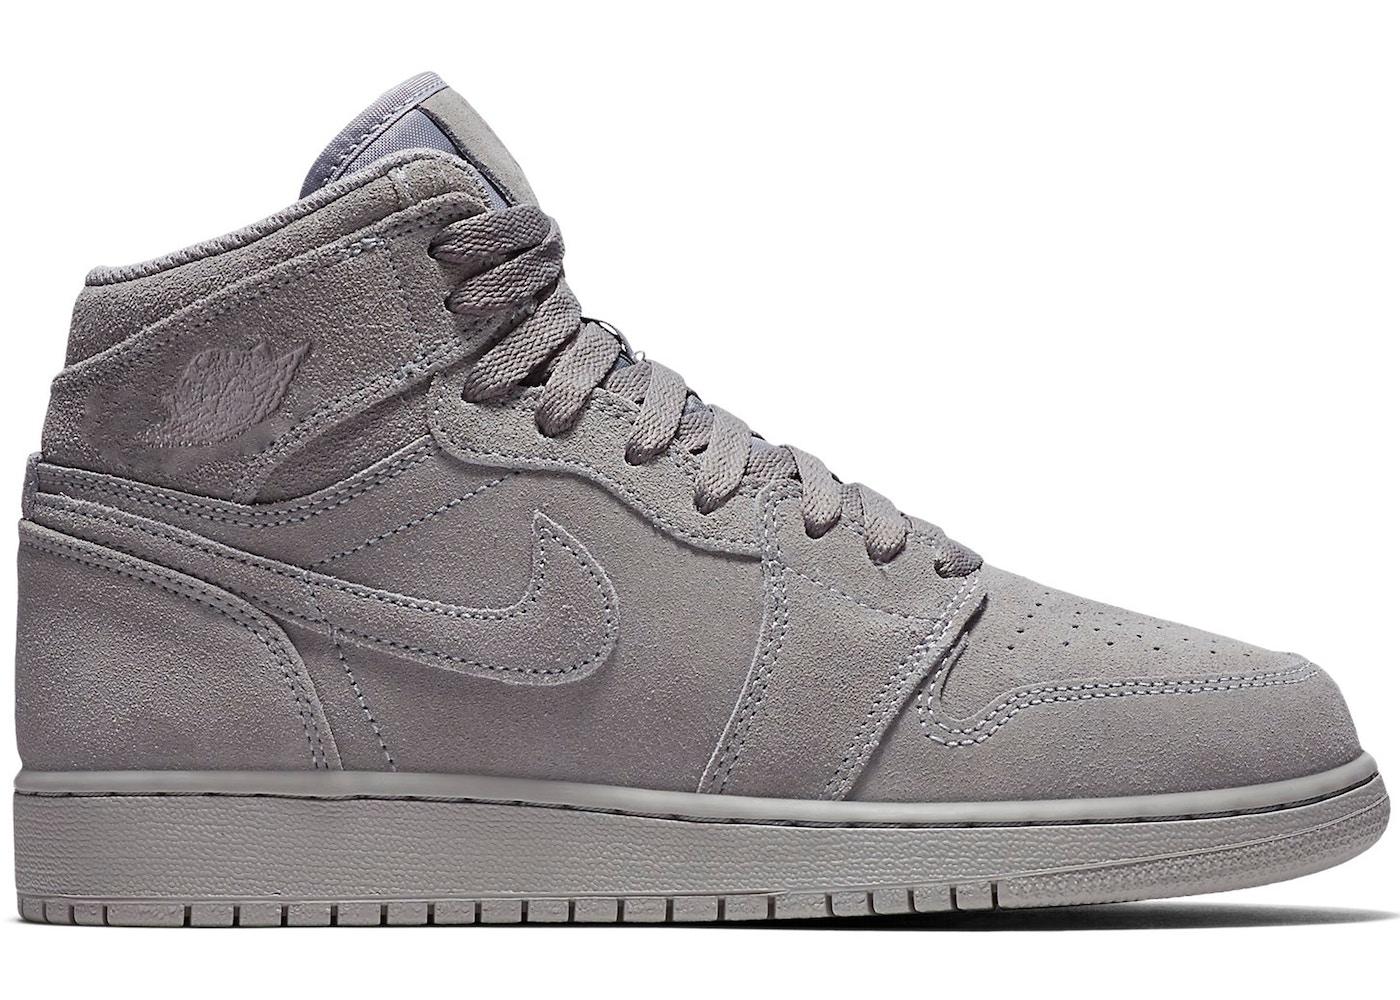 new products 9d02b 6634d Jordan 1 Retro High Grey Suede (GS)